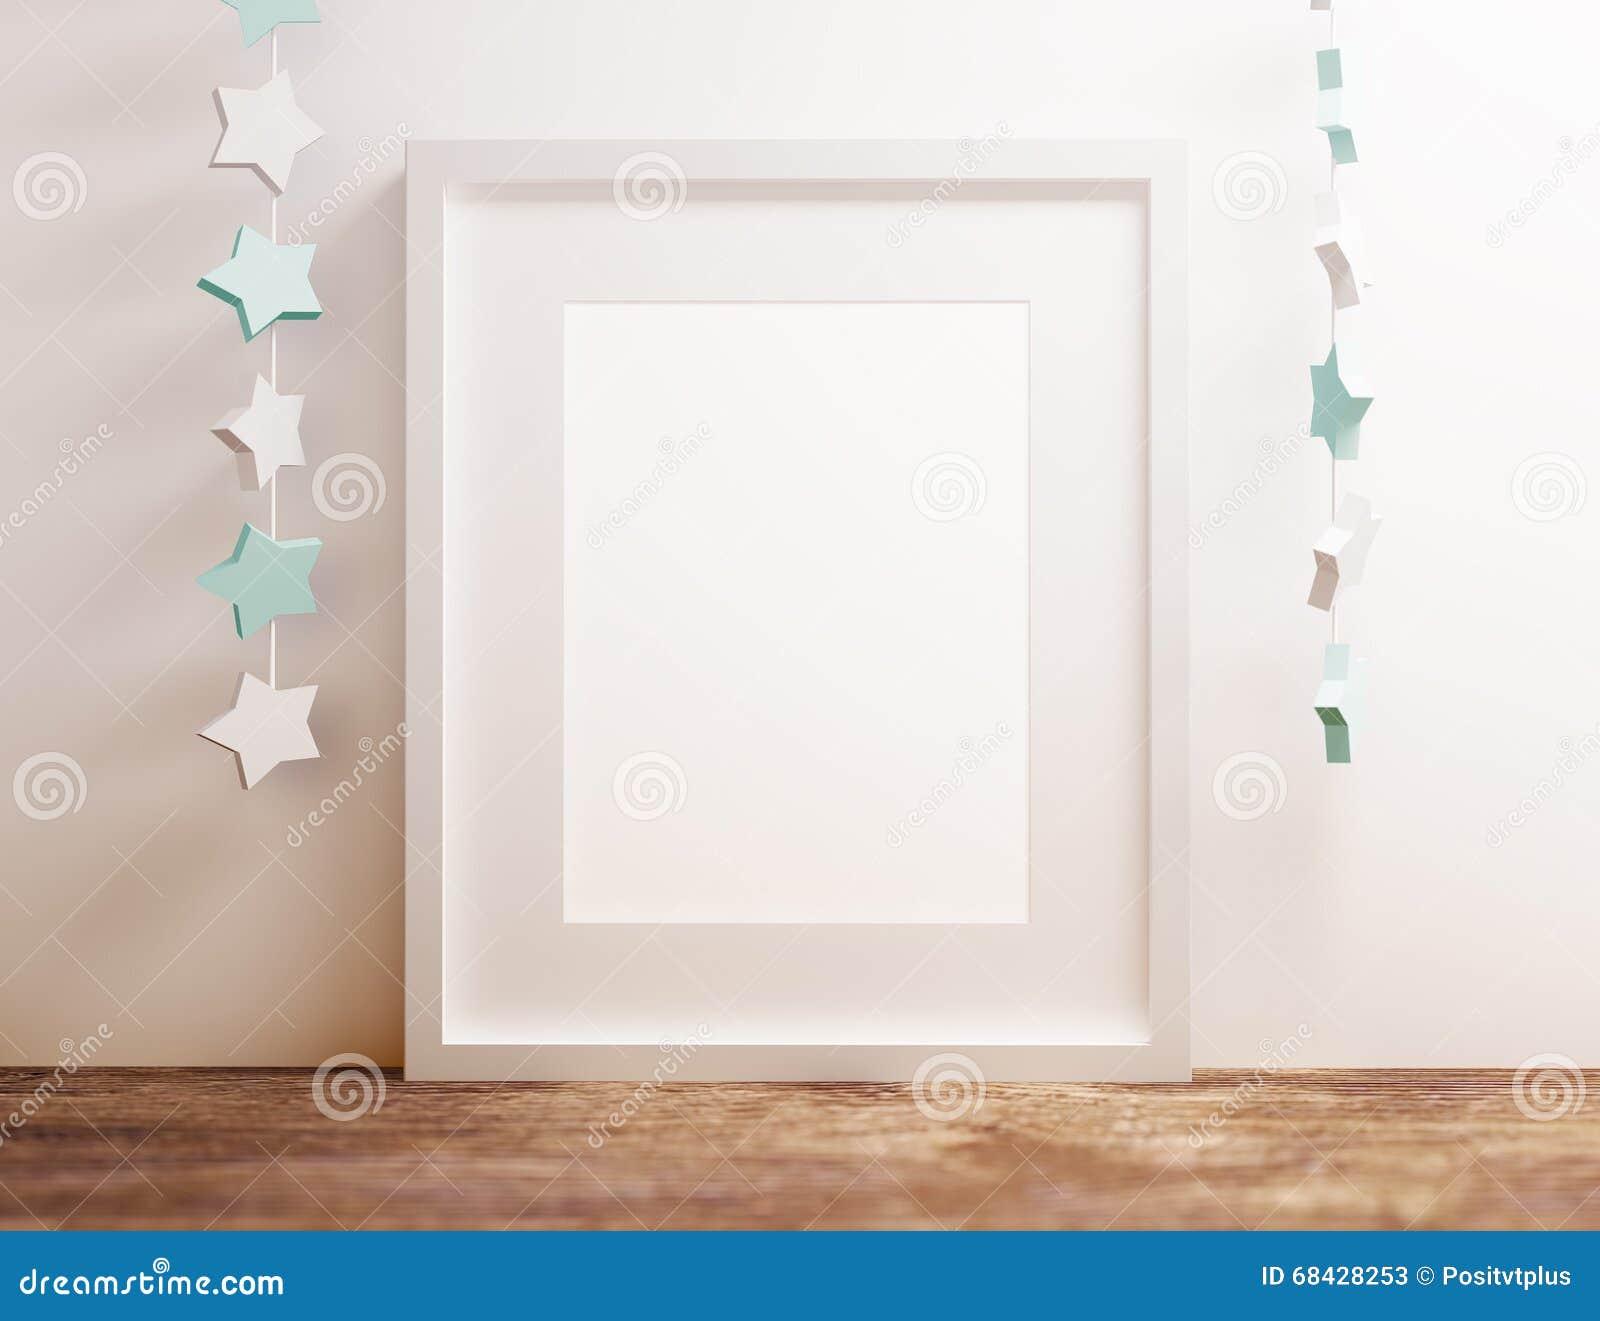 blank white poster frame at wooden shelf with star nursery theme - White Poster Frame